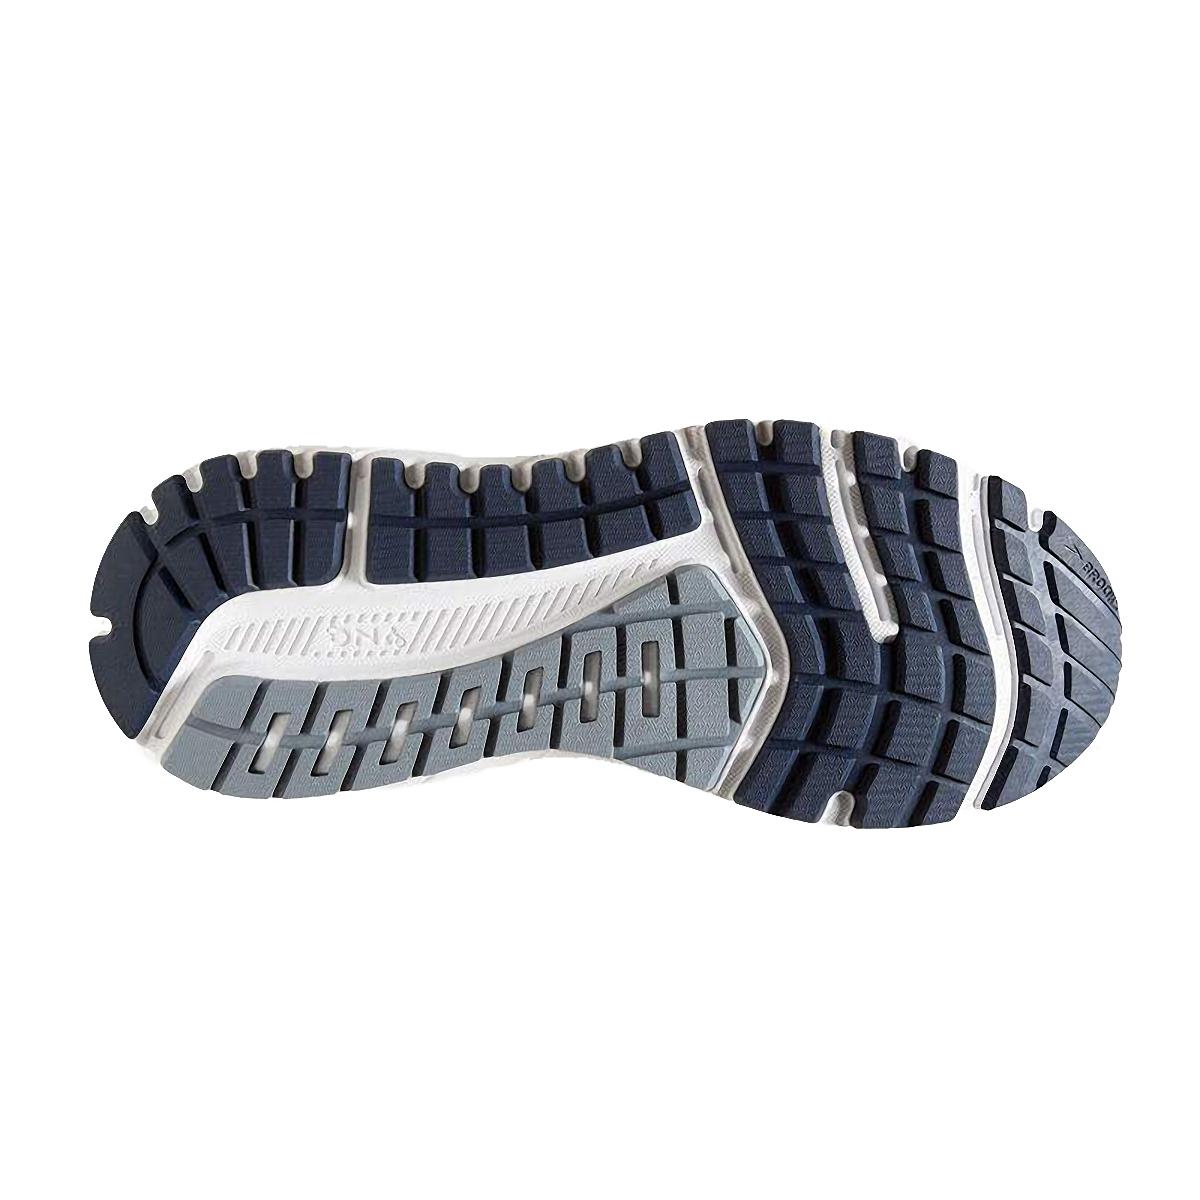 Men's Brooks Beast 20 Running Shoe - Color: Blue/Grey/Peacoat (Regular Width) - Size: 8, Blue/Grey/Peacoat, large, image 3